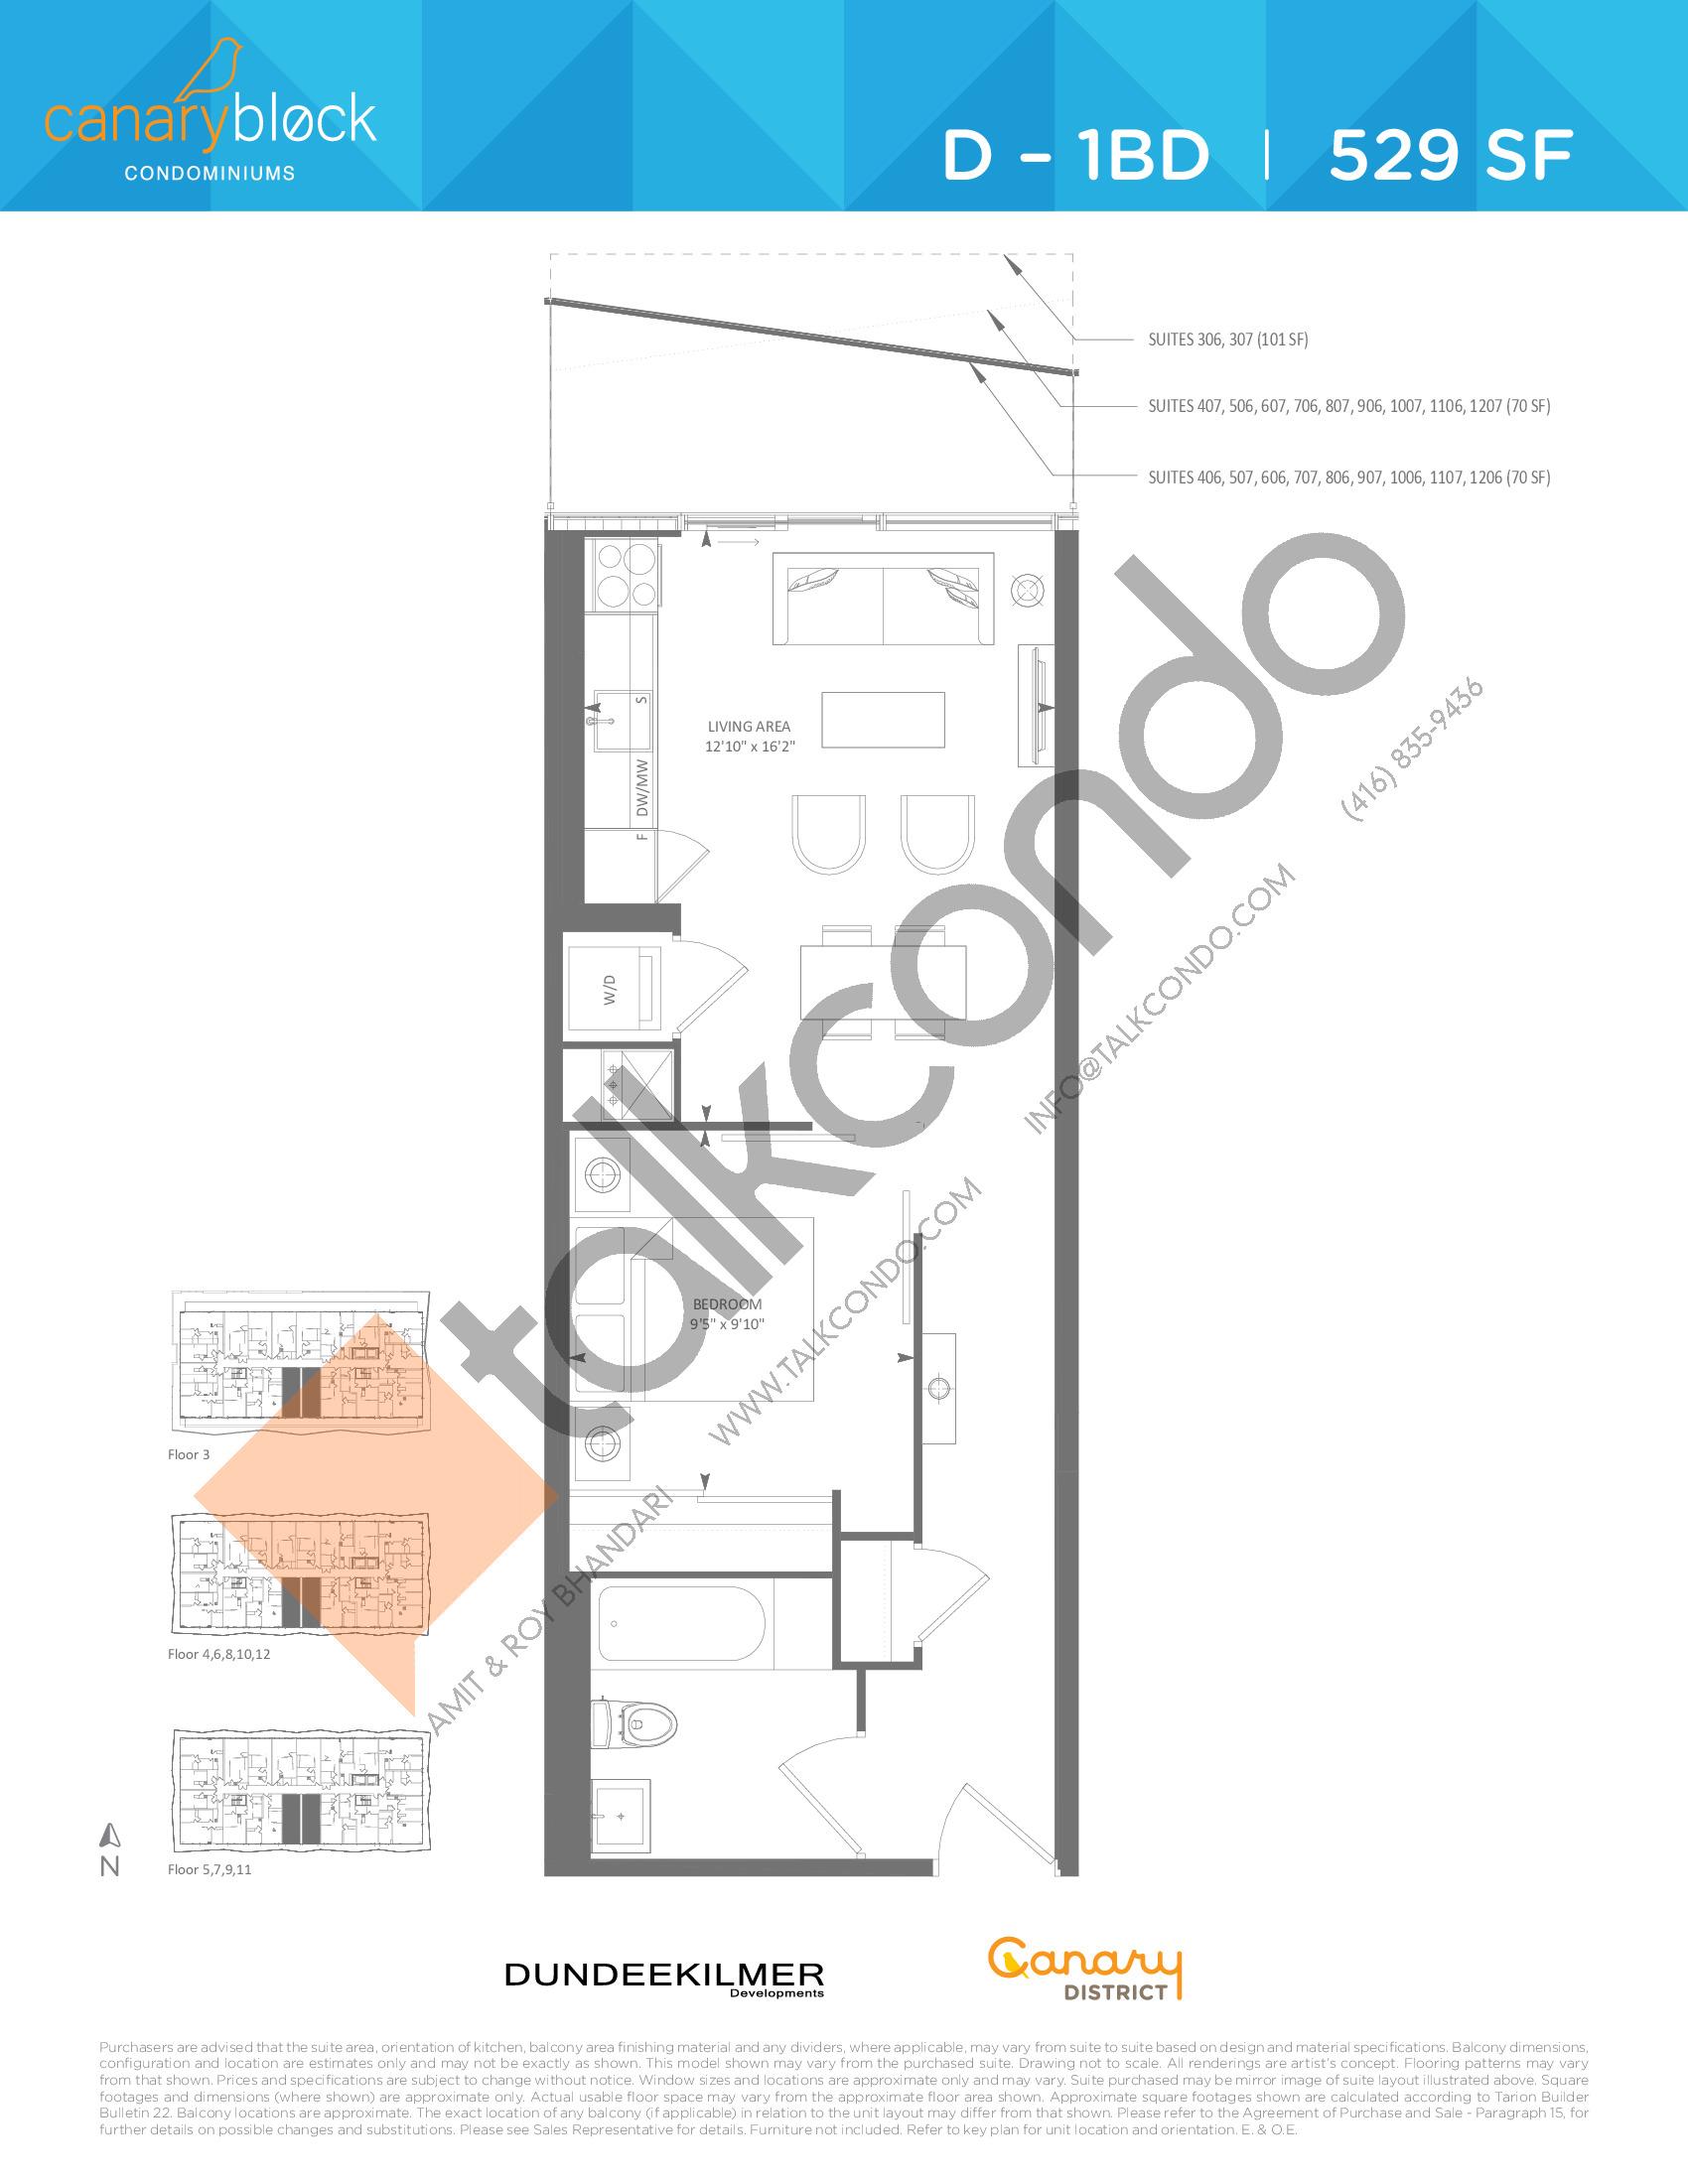 D - 1BD Floor Plan at Canary Block Condos - 529 sq.ft